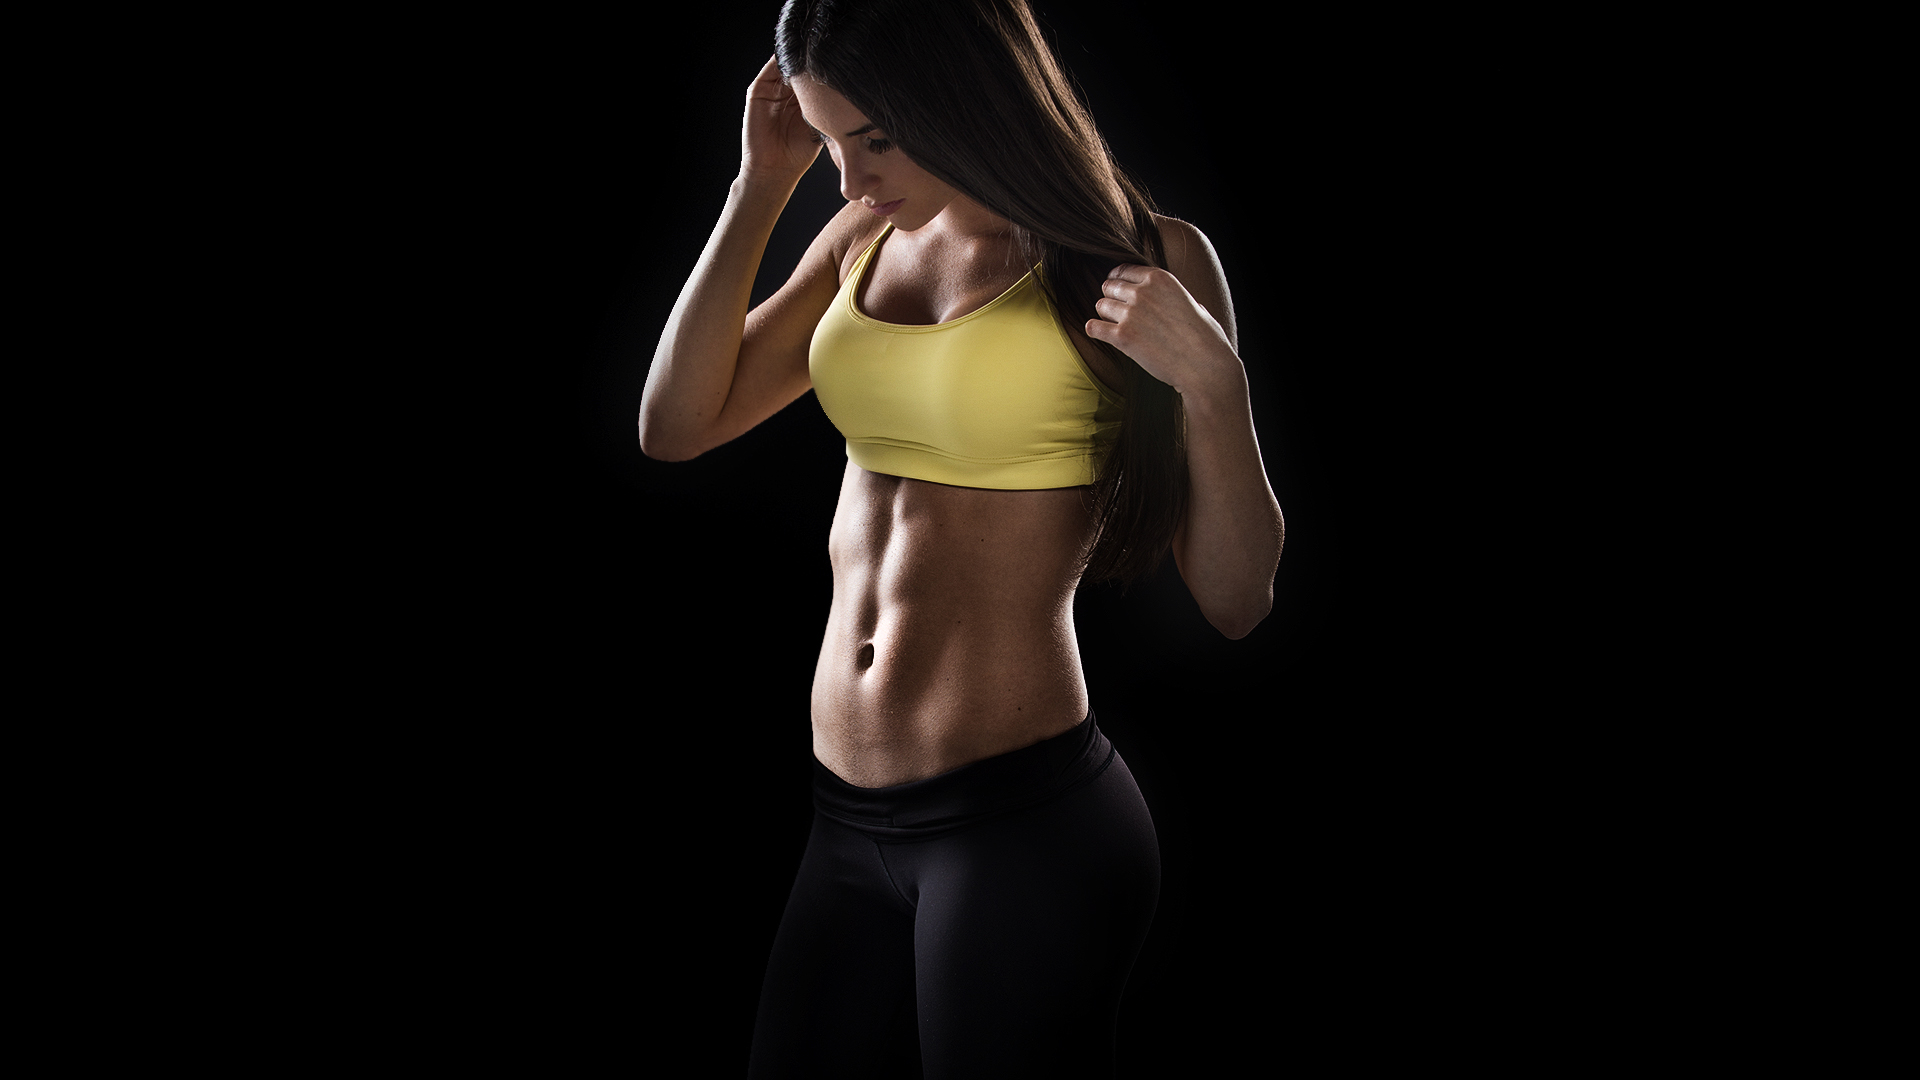 Fitness Wallpaper HD